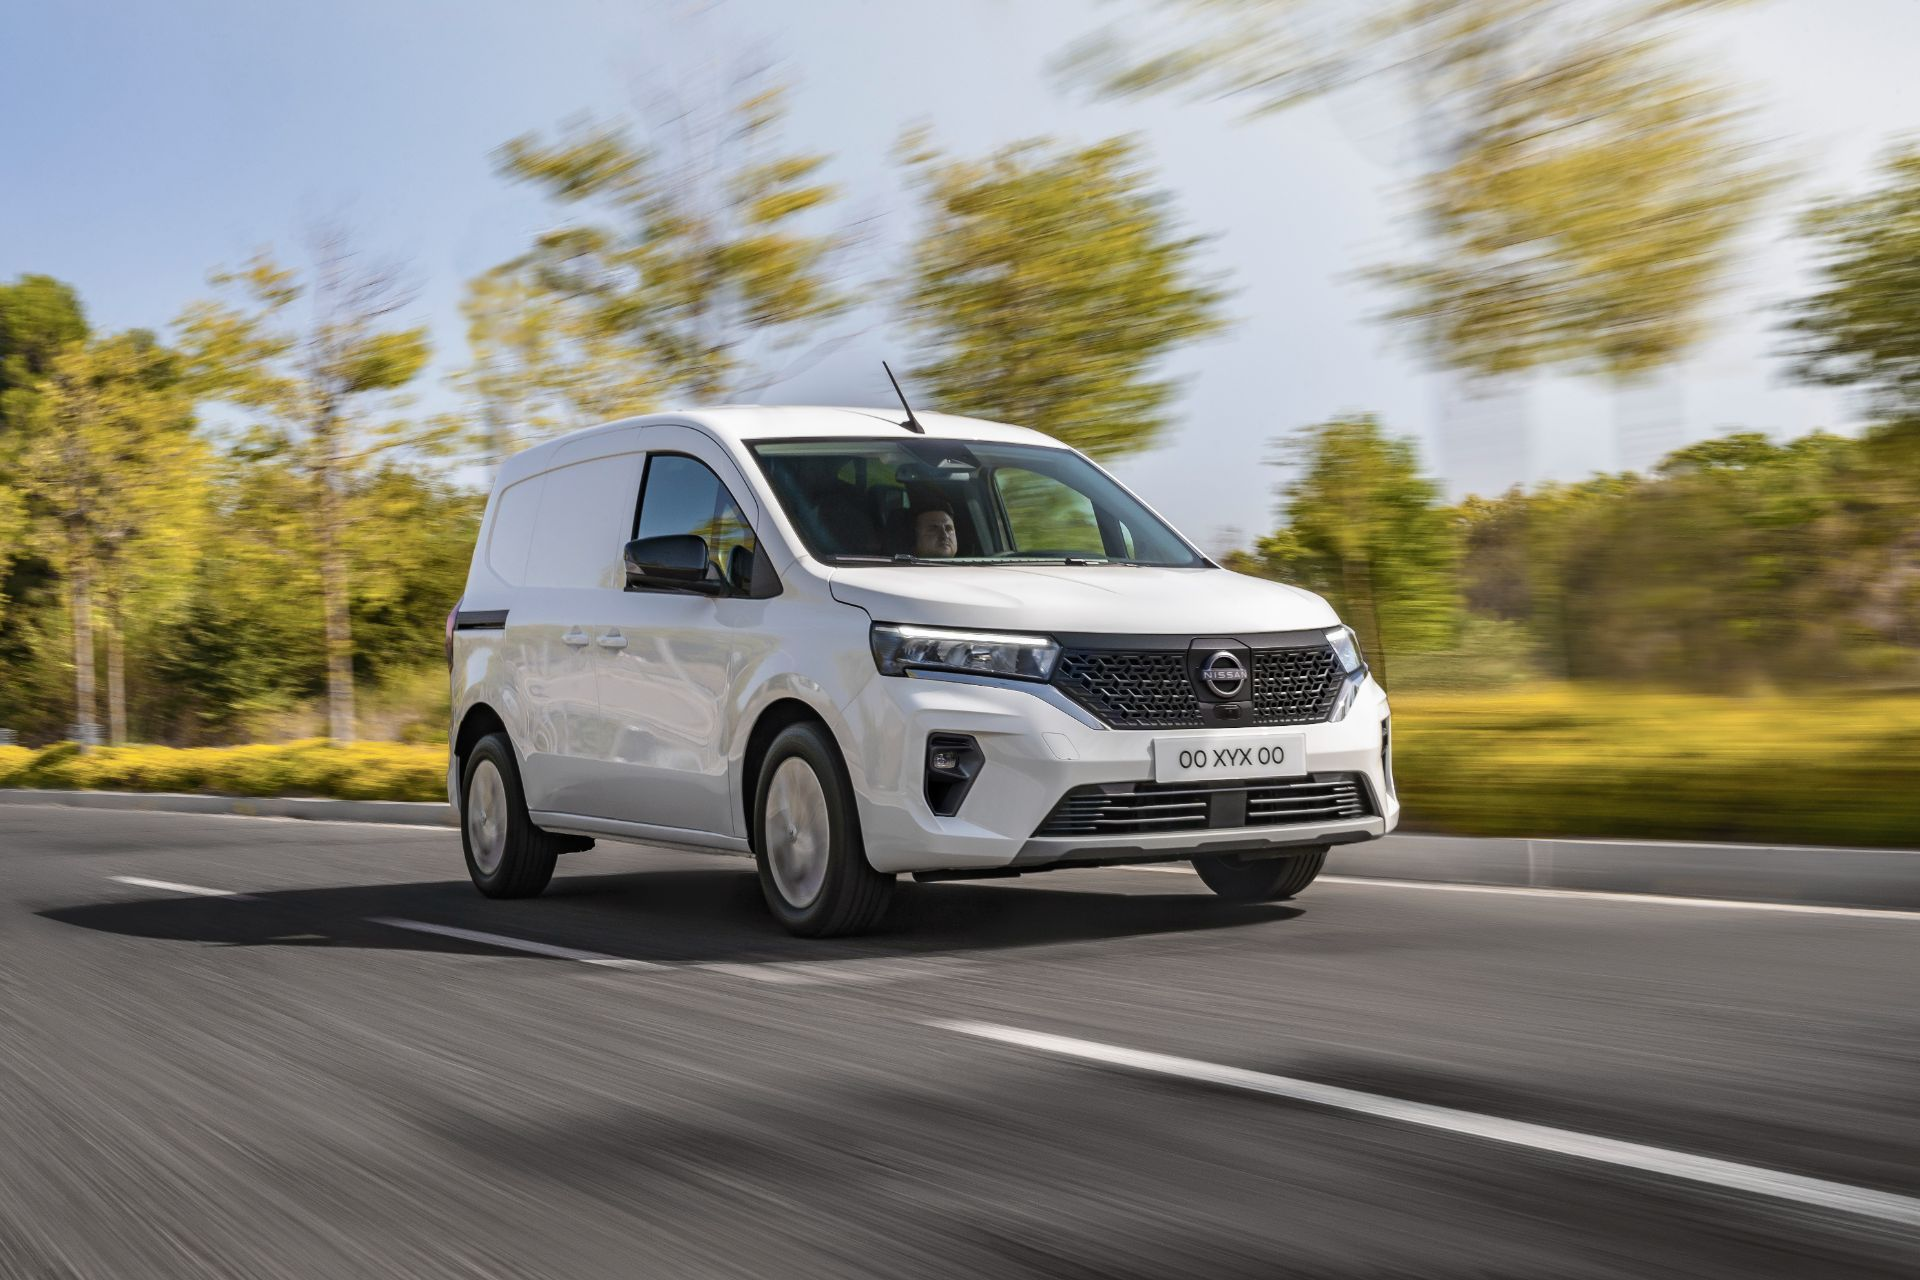 2022-Nissan-Townstar-EV-van-dynamic-2-1